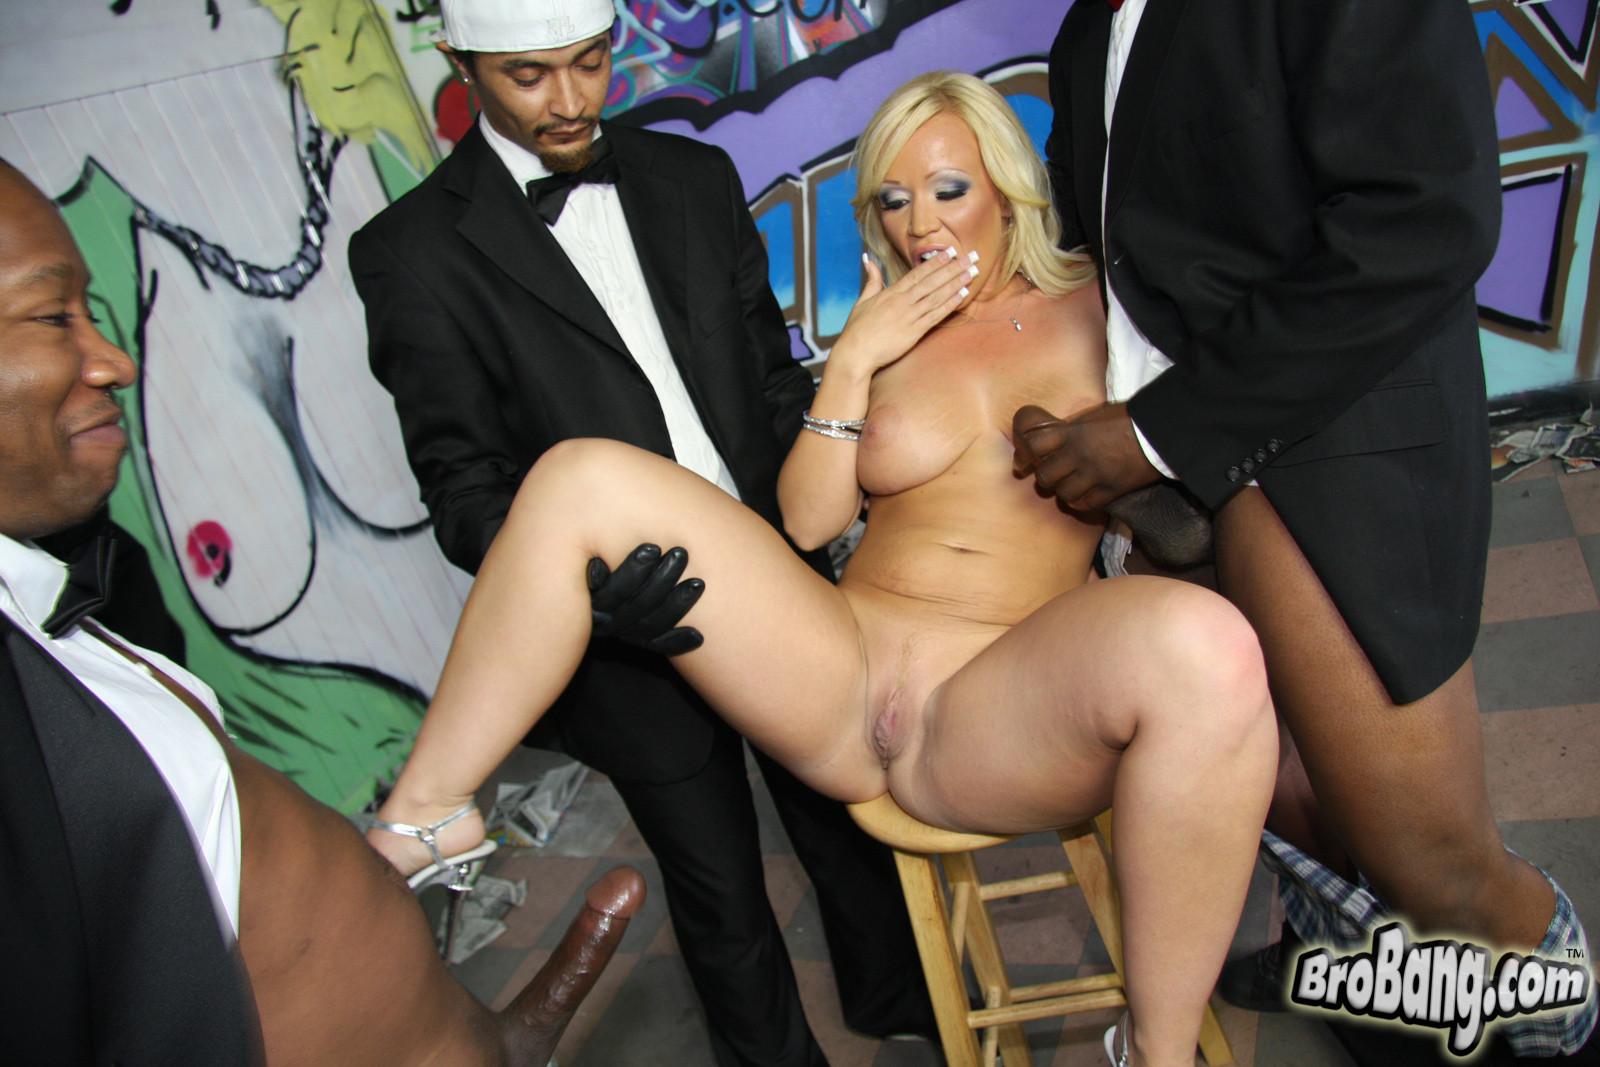 Black girl porn pitcher